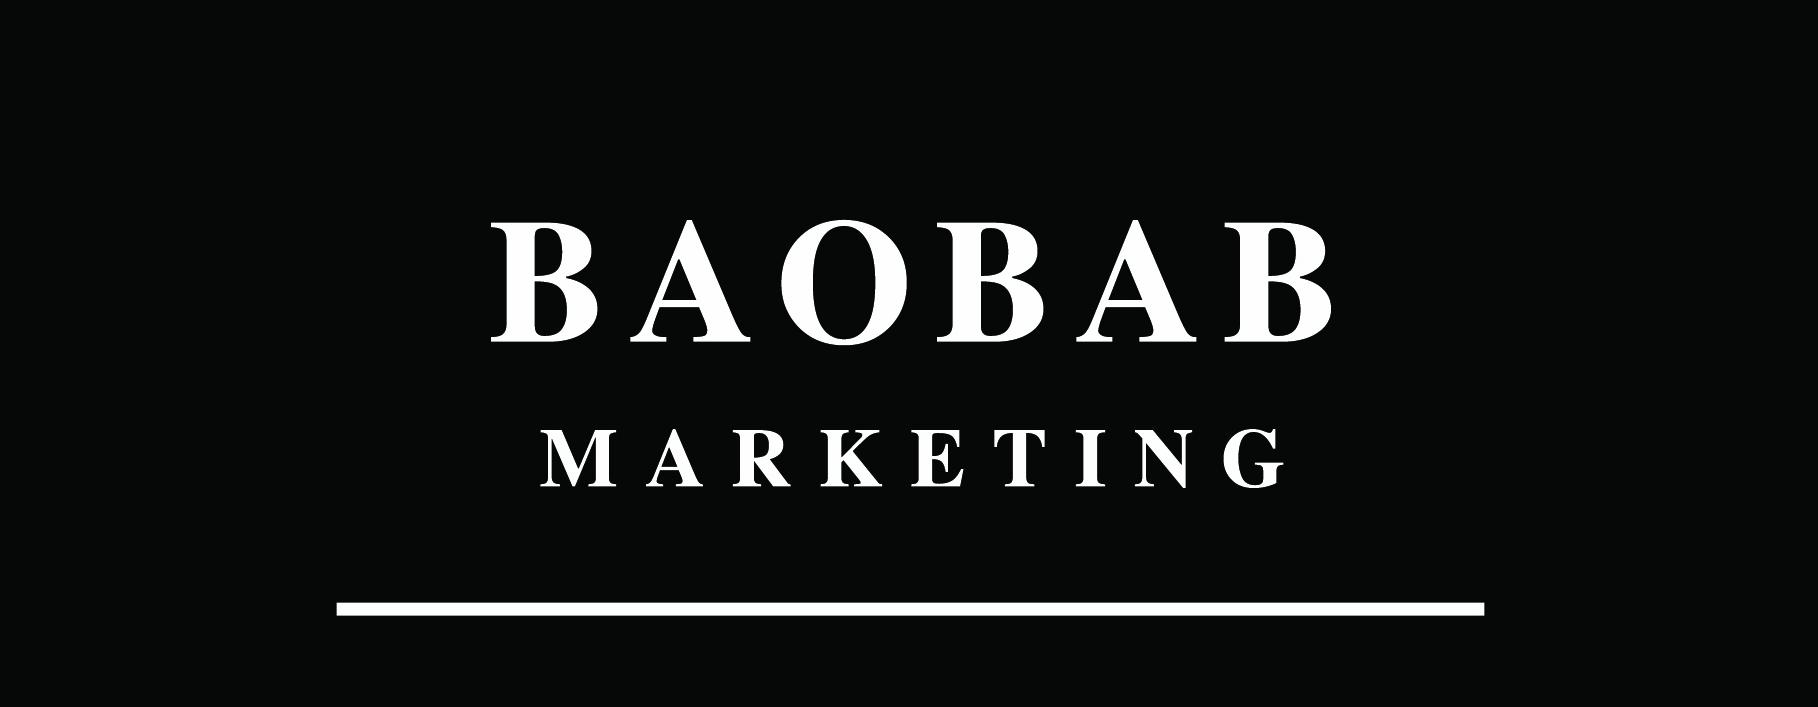 Baobab Marketing